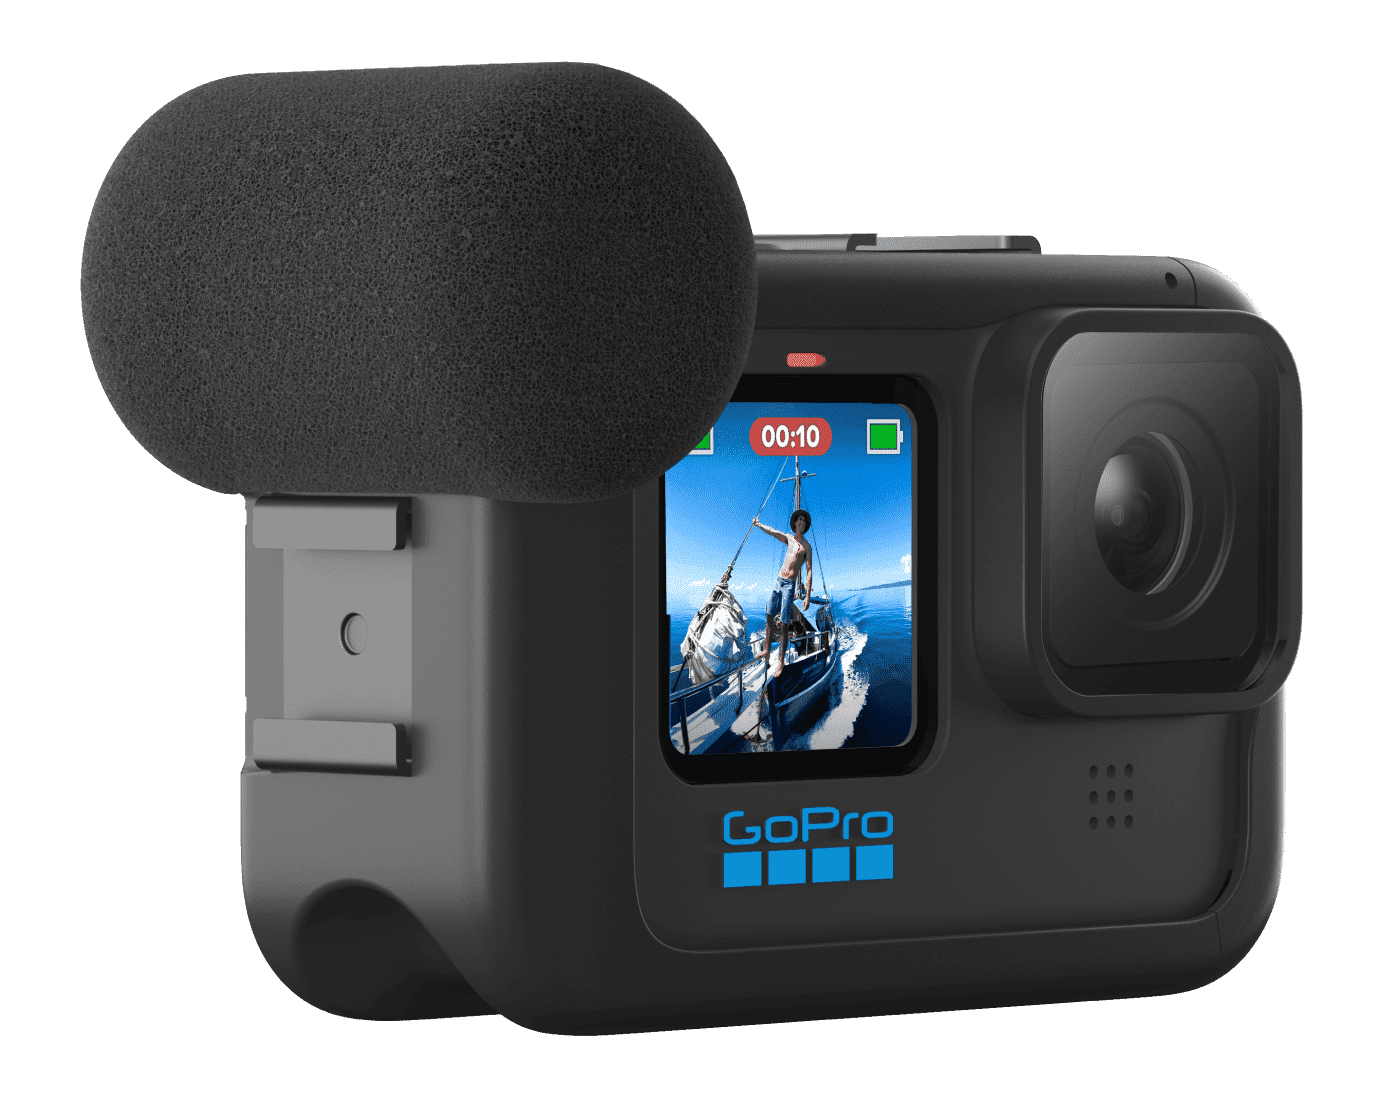 hero10-black-camera-media-mod-front-image